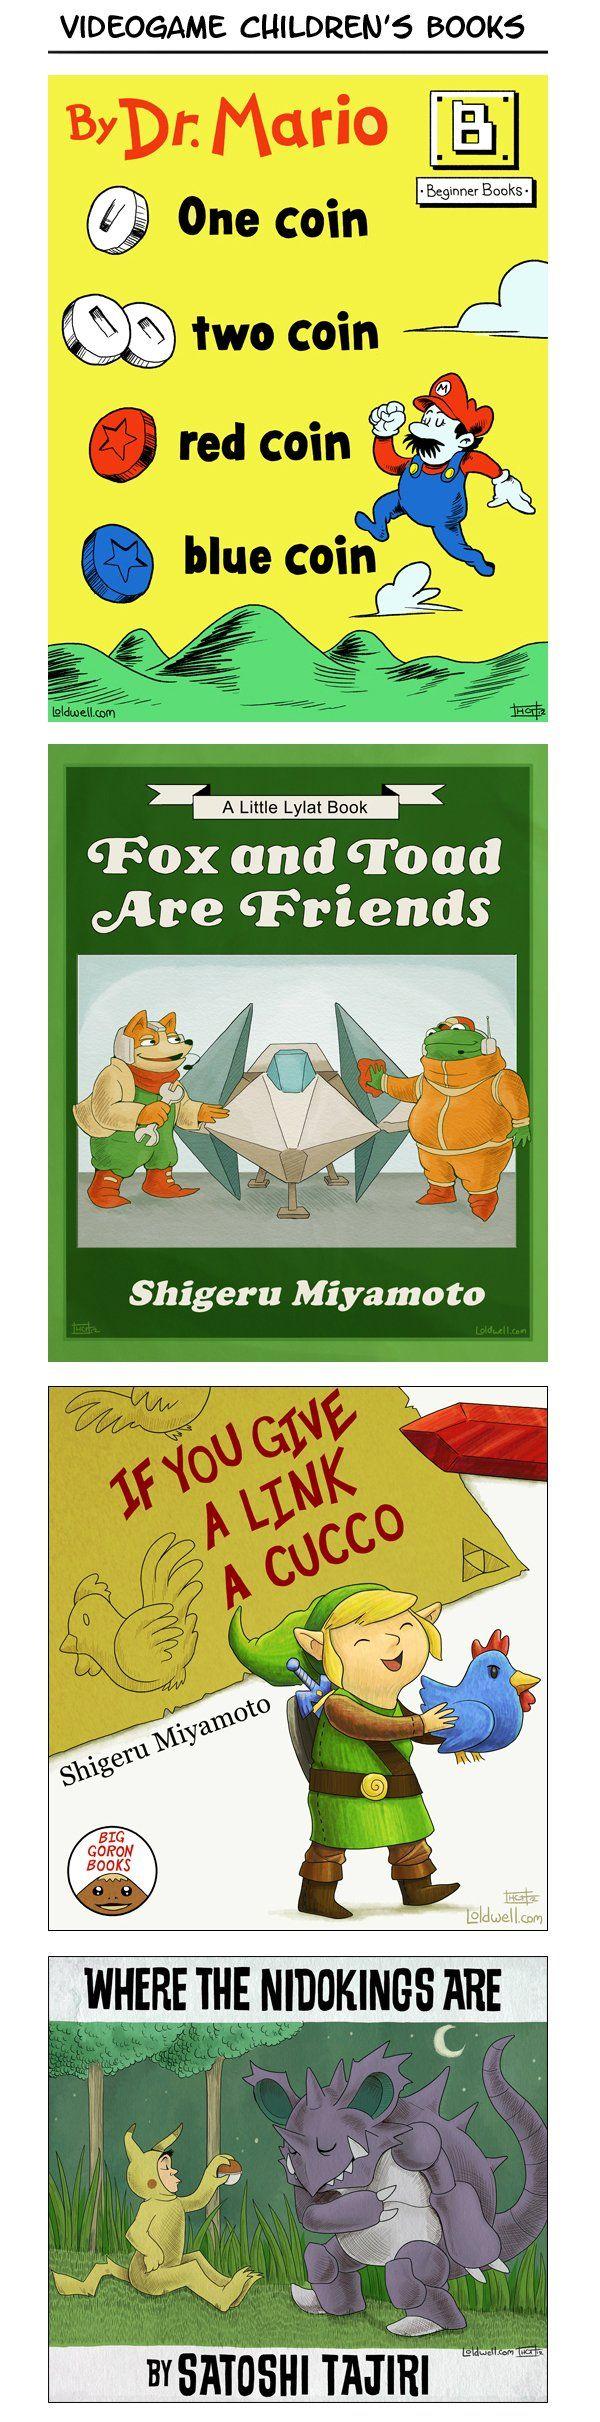 Video game children's books I wish were real